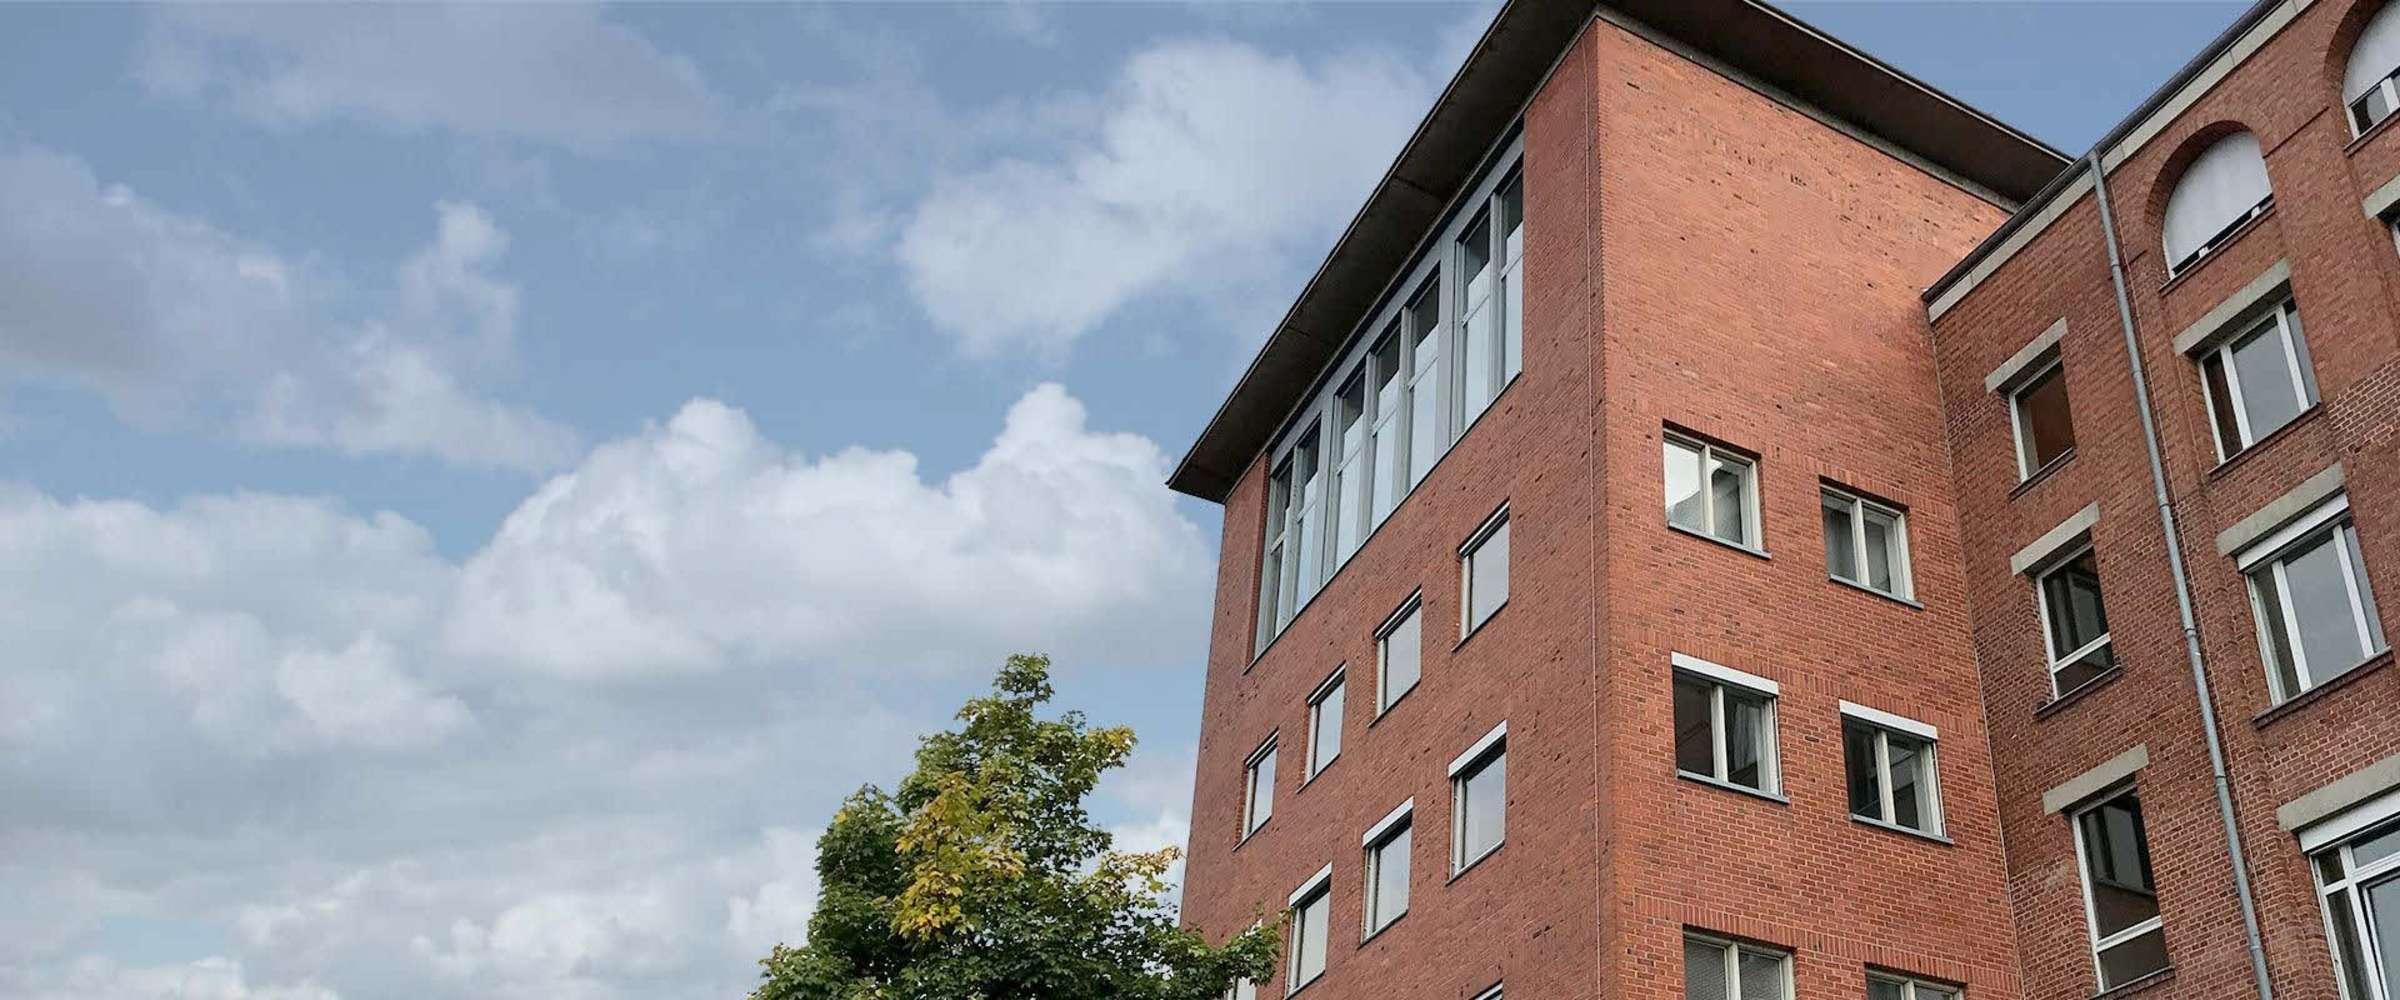 Büros Frankfurt am main, 60314 - Büro - Frankfurt am Main, Ostend - F1260 - 10545564